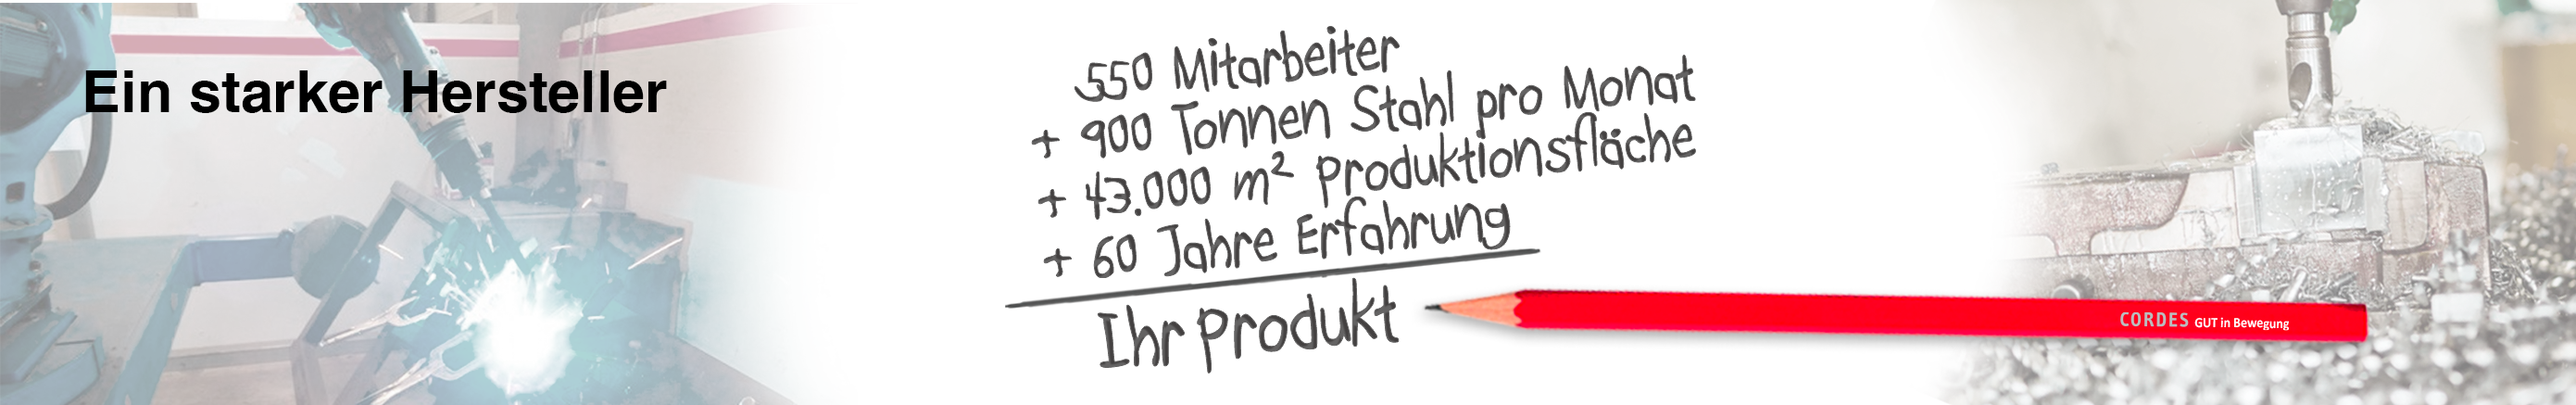 Starker-Hersteller-de